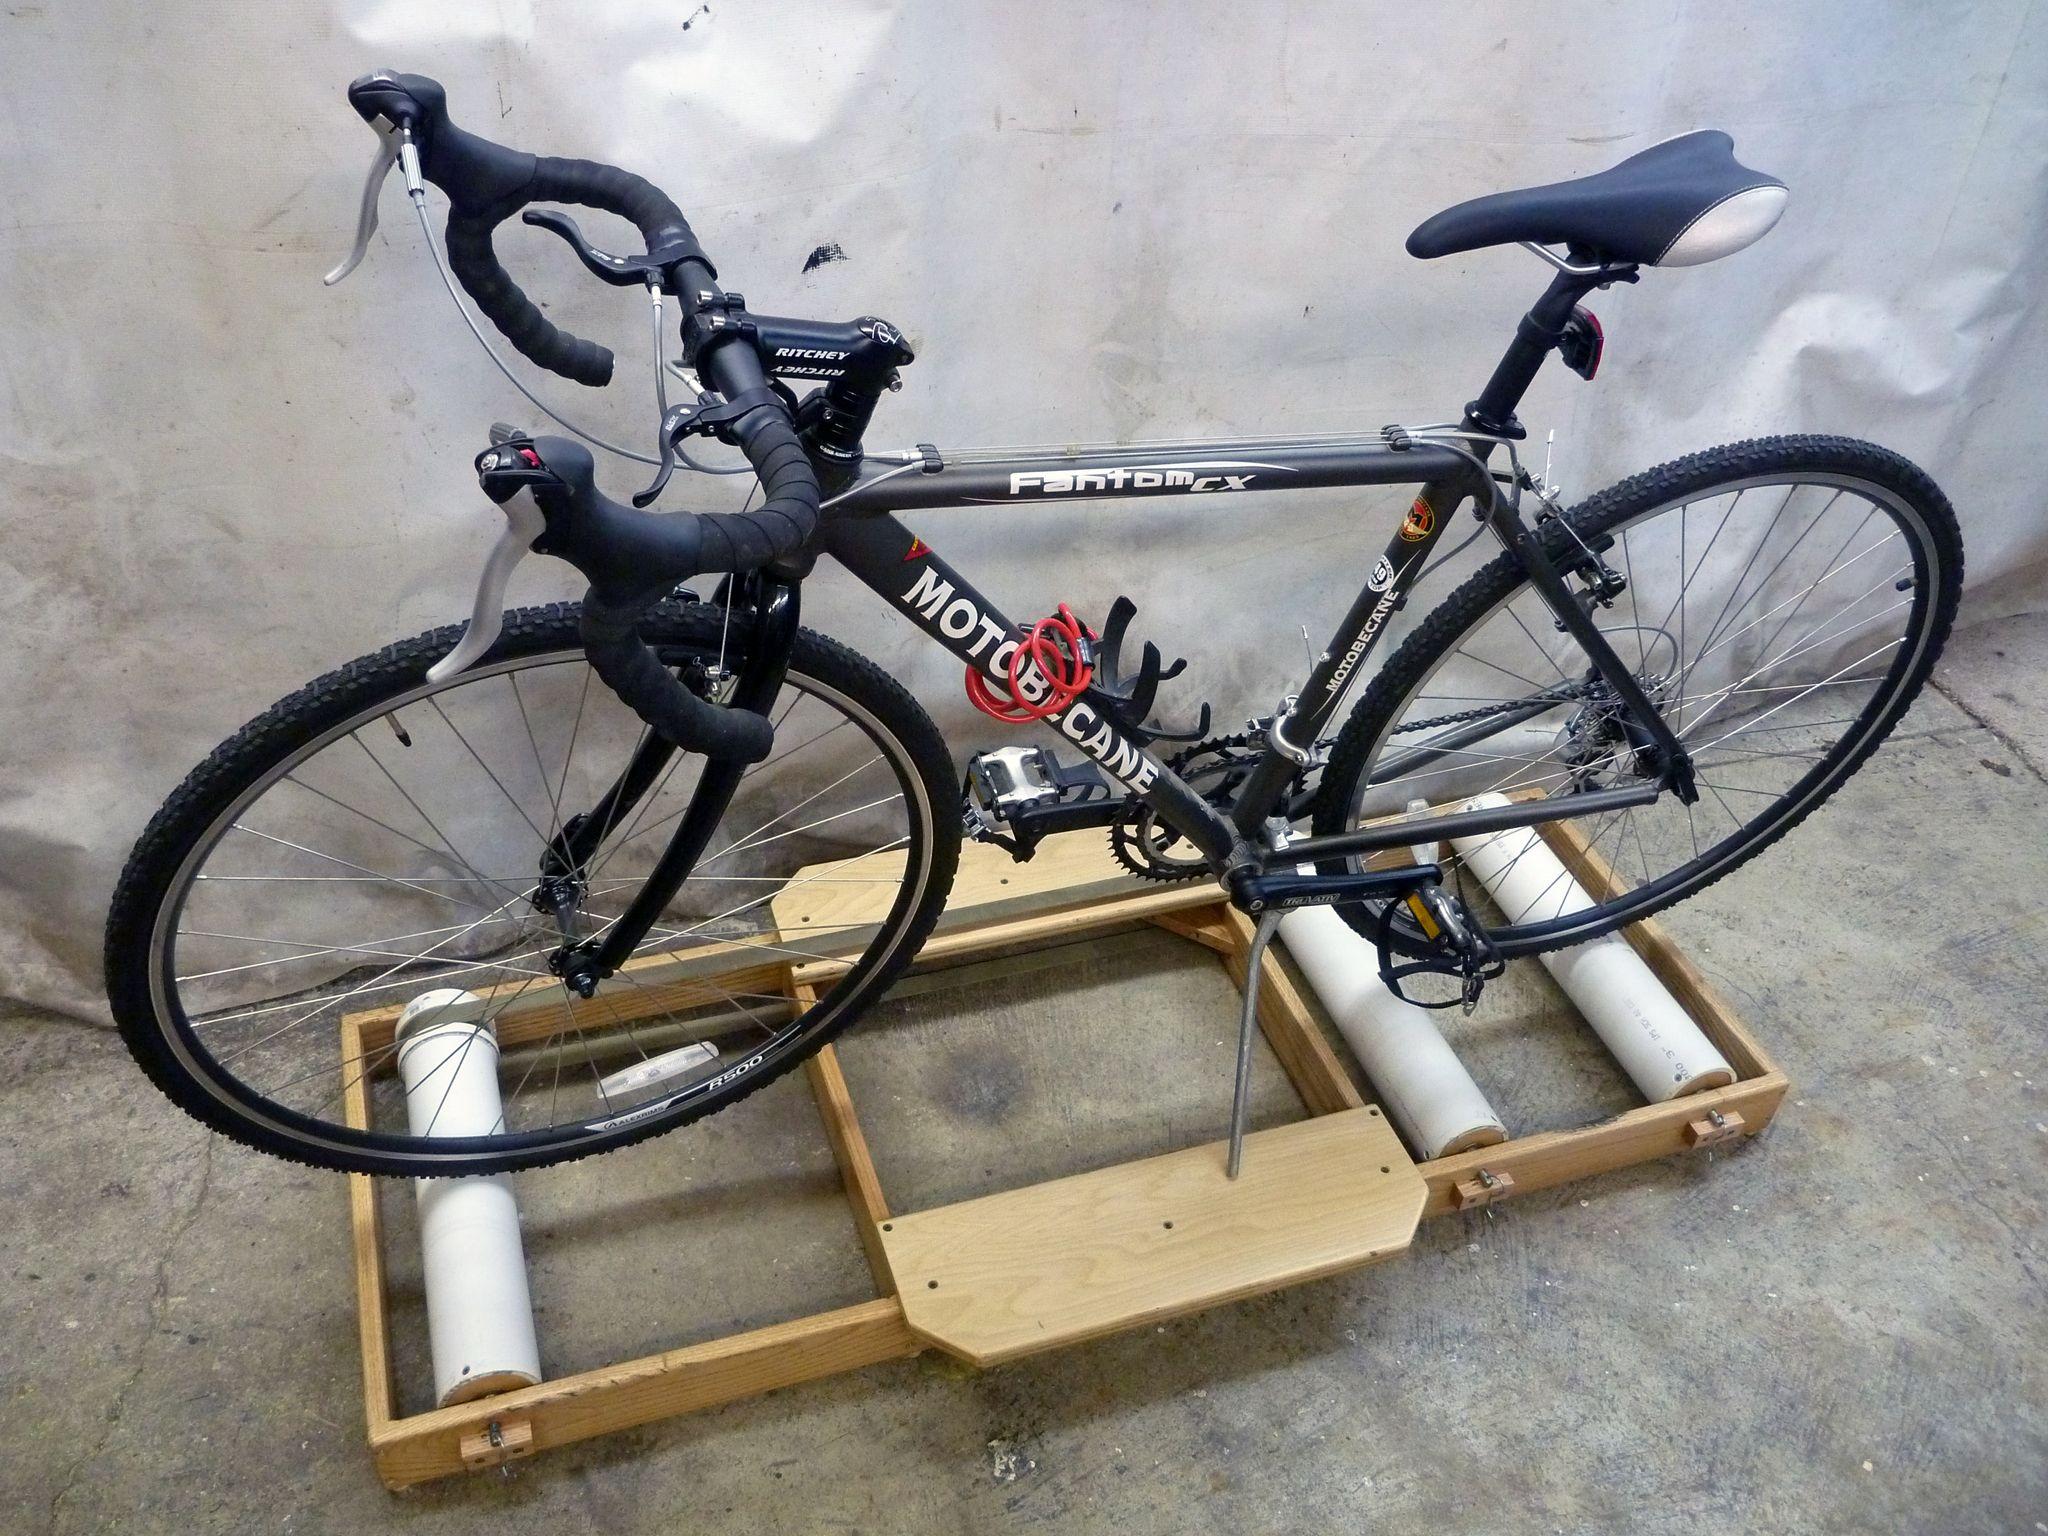 Diy bike rollers bike rollers bicycle rollers indoor